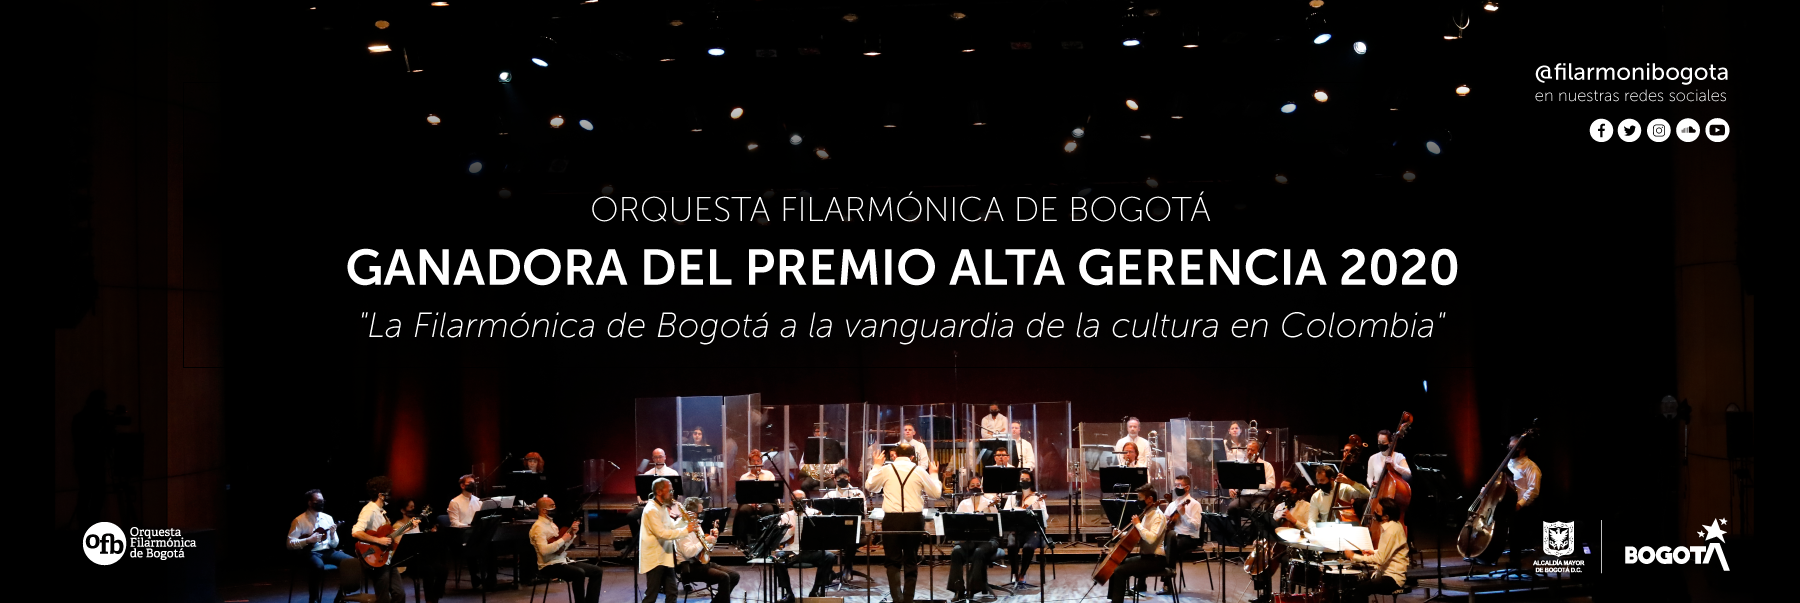 OFB GANADORA PREMIO ALTA GENERENCIA 2020